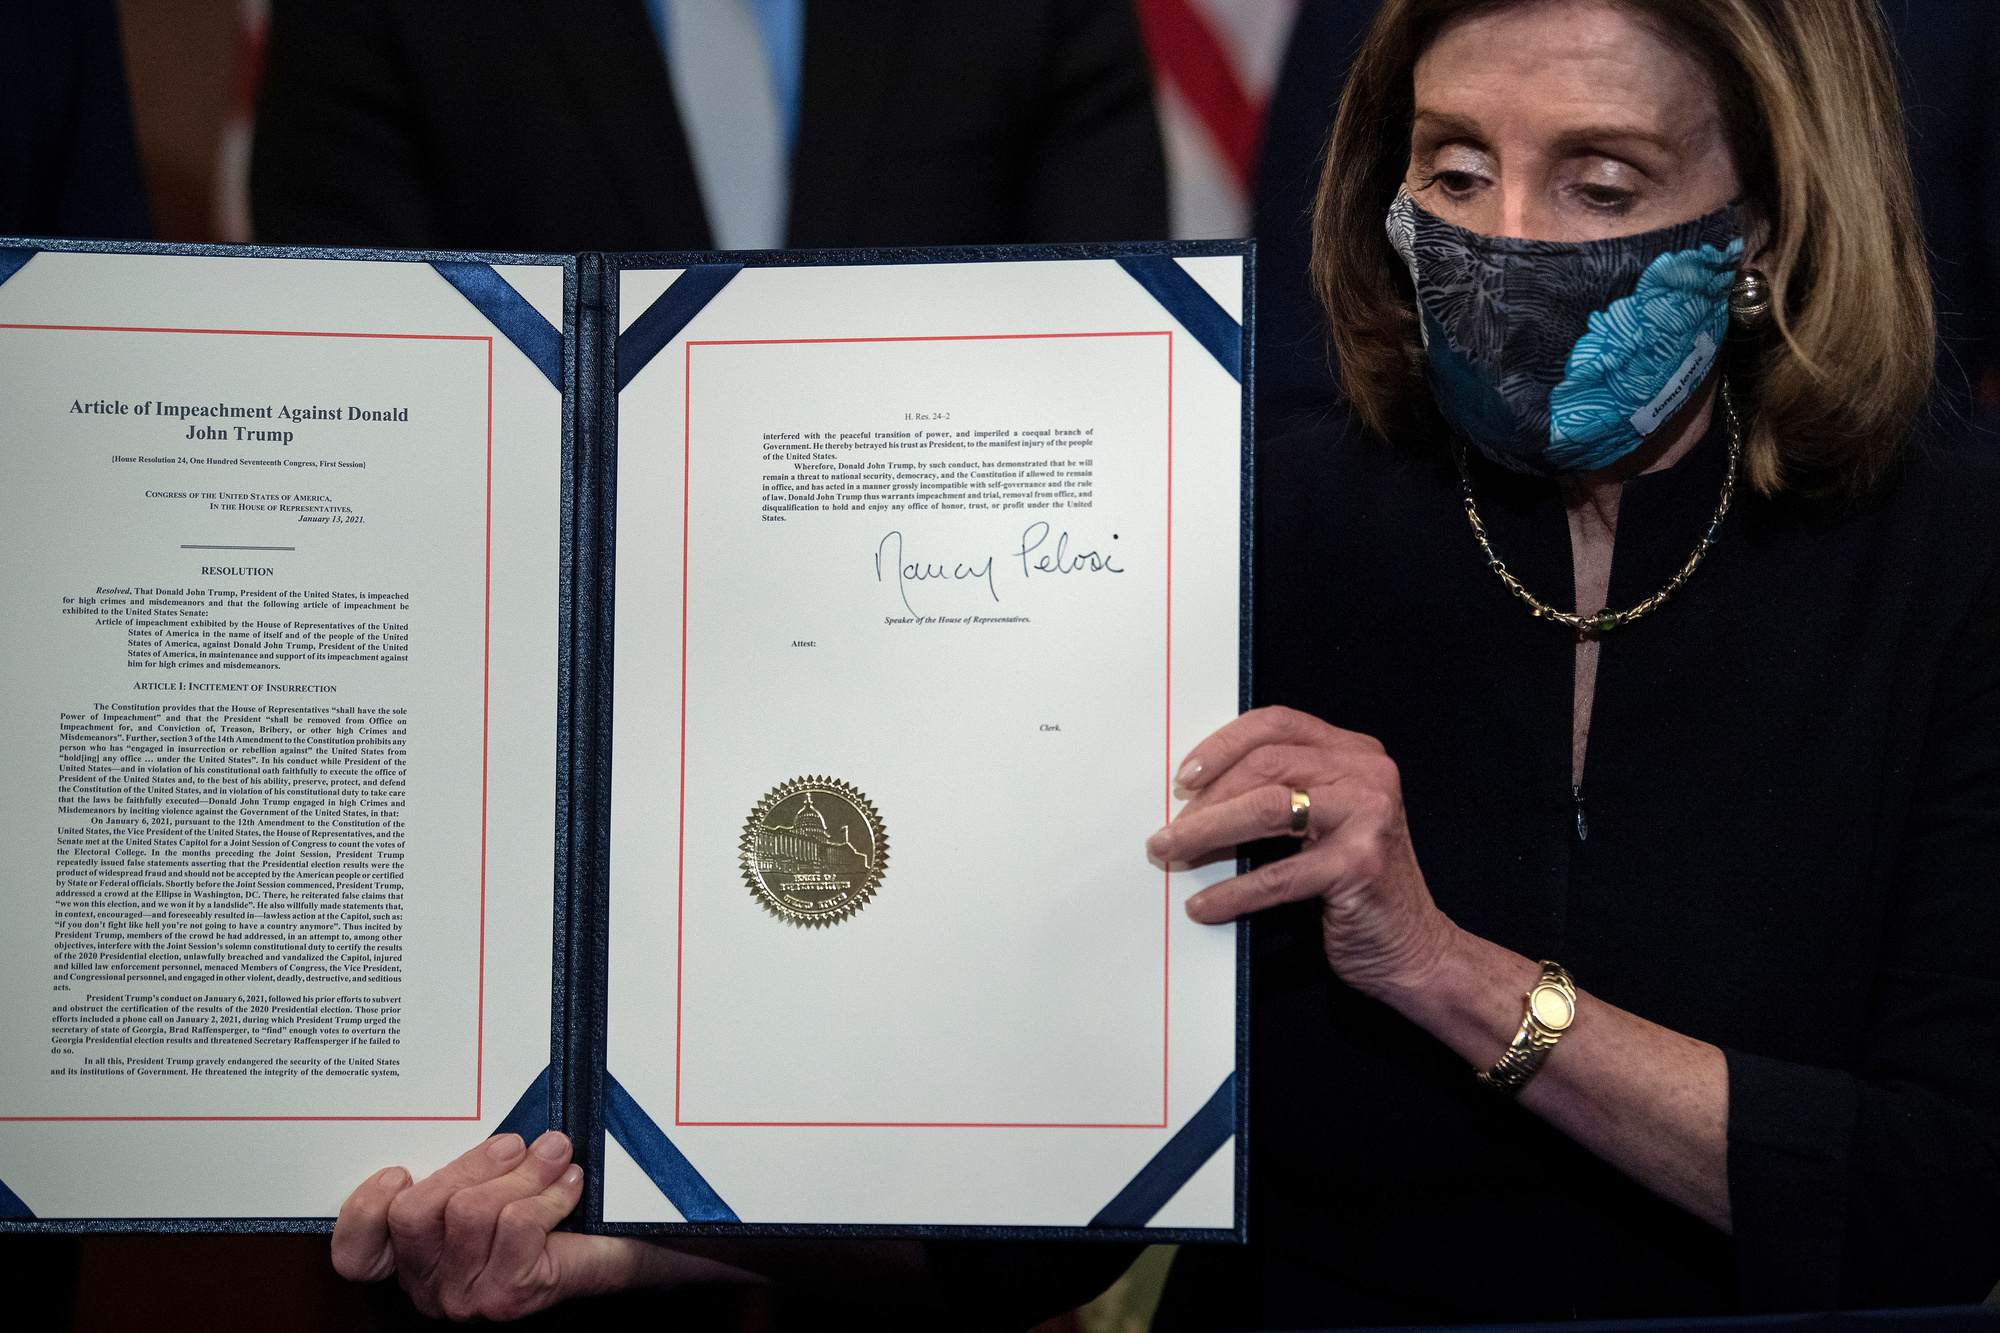 Nancy Pelosi tient l'acte de destitution signé., BELGA IMAGE